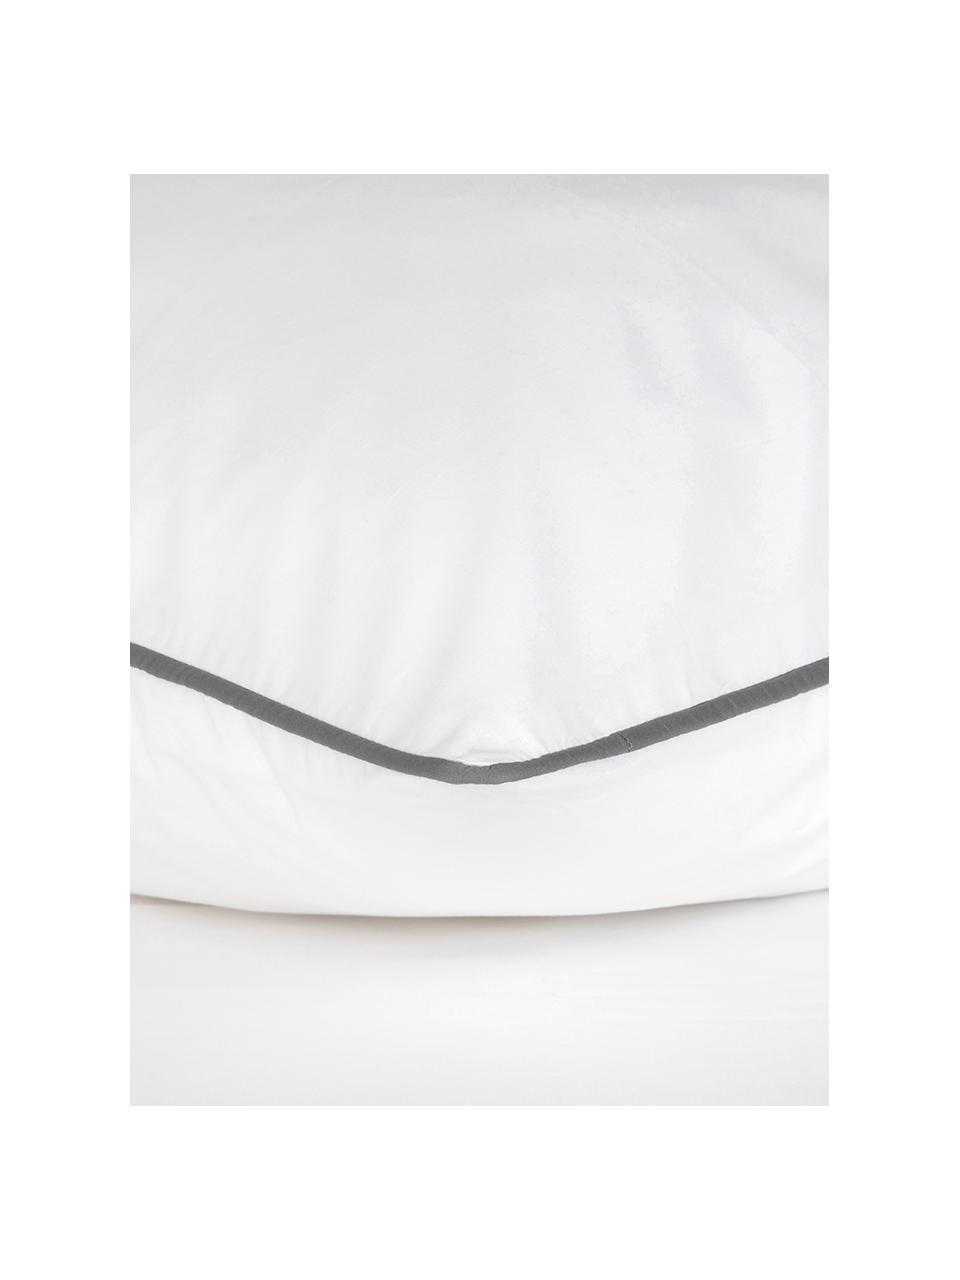 Baumwollperkal-Kissenbezüge Daria in Weiß mit Keder, 2 Stück, Webart: Perkal Fadendichte 200 TC, WeißKederumrandung: Dunkelgrau, 40 x 80 cm